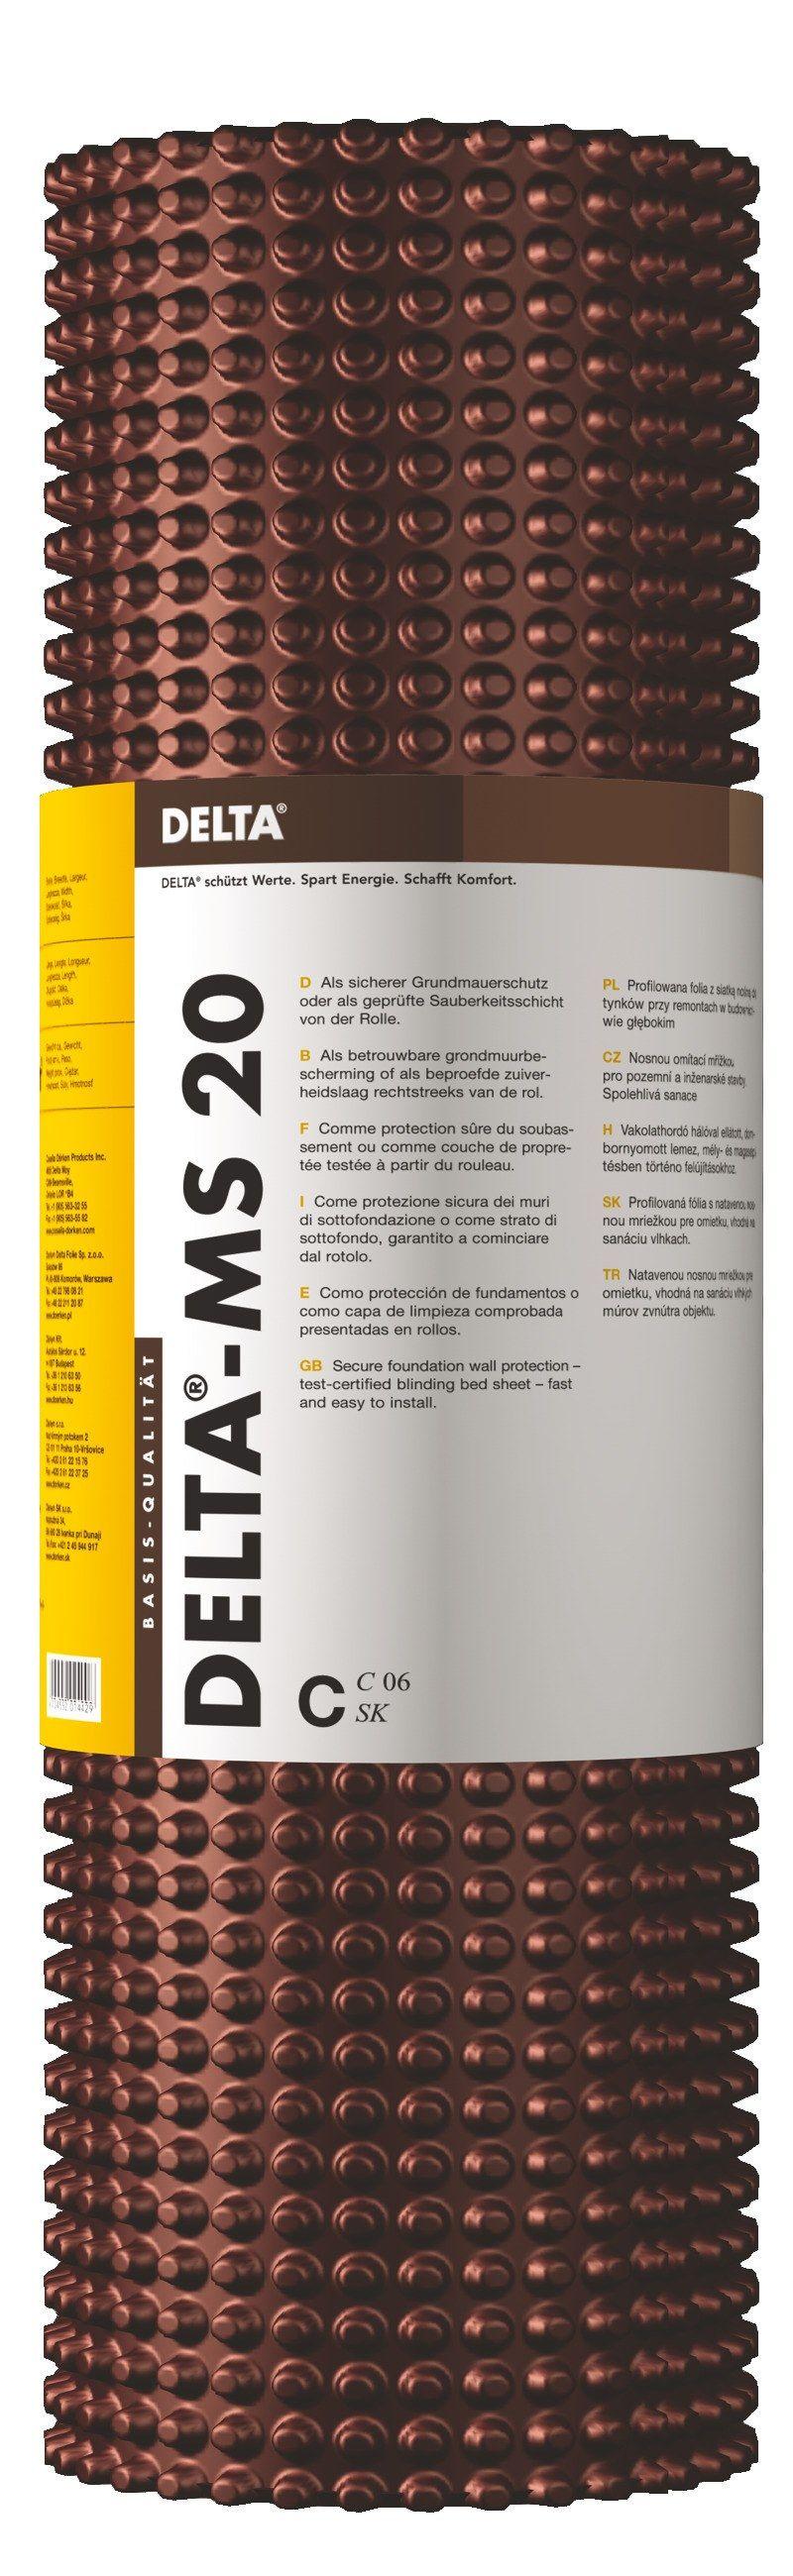 DELTA® - MS 20